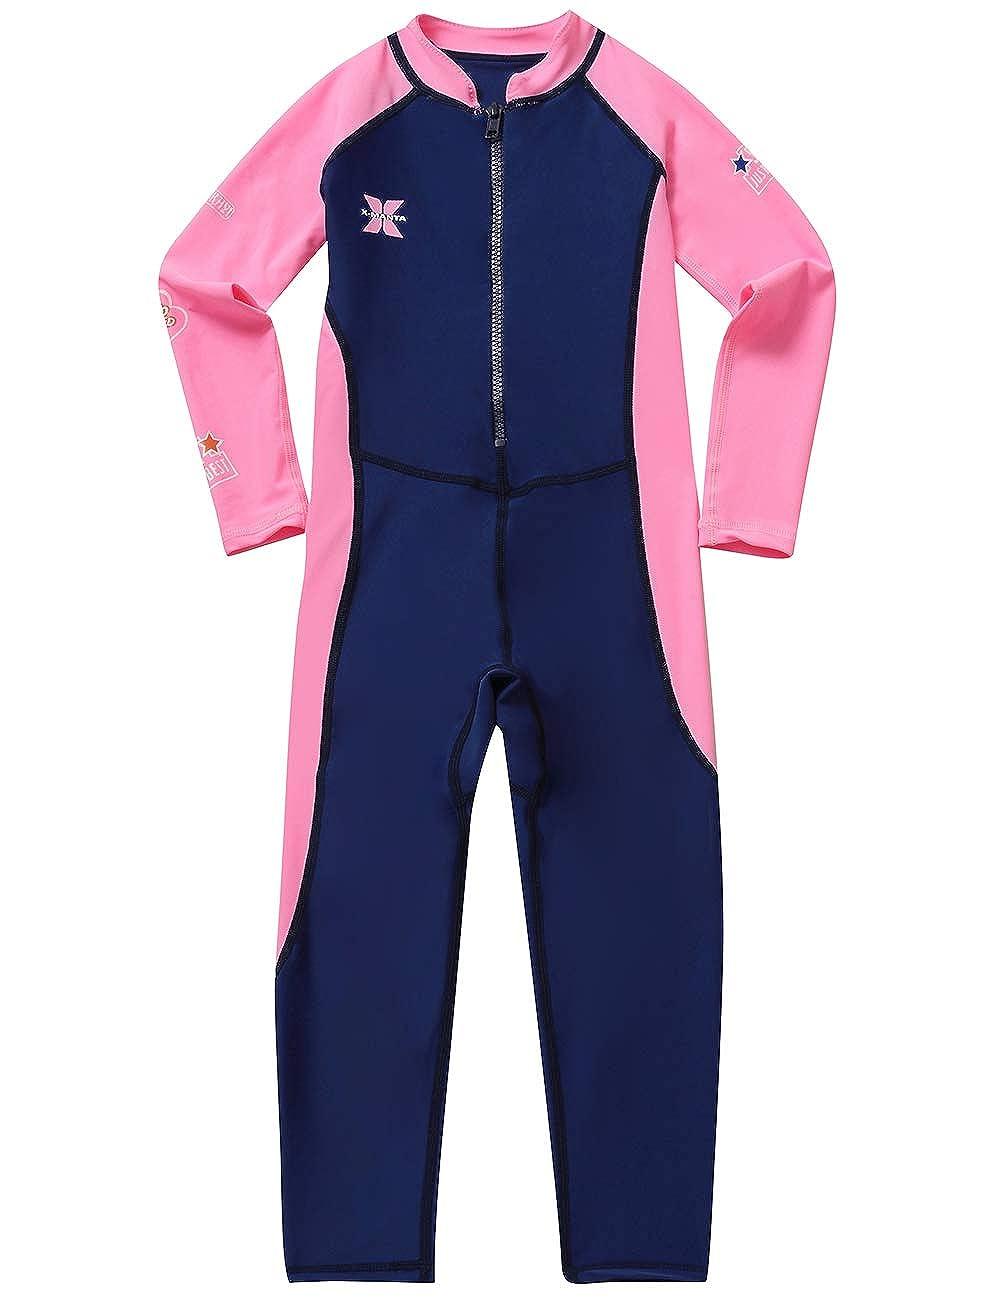 86b6f0b19e Boys Boys Girls One Piece Sunsuit Swimwear Clothing Gogokids Kids Long Sleeves  Swimsuit